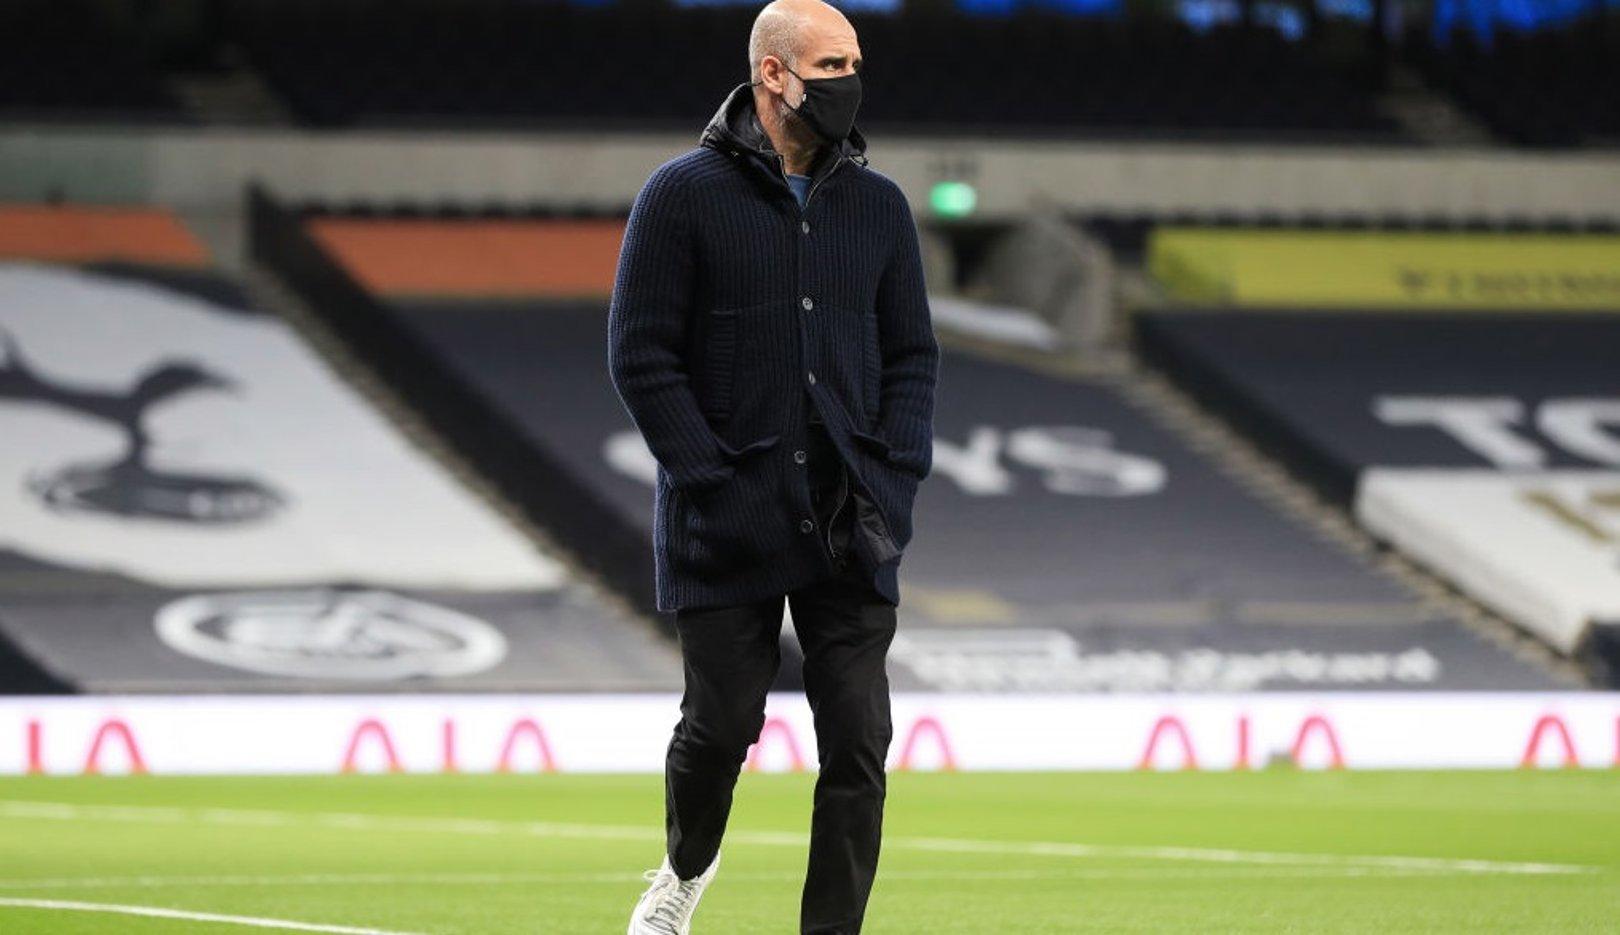 Pep Guardiola arrives at the Tottenham Hotspur Stadium